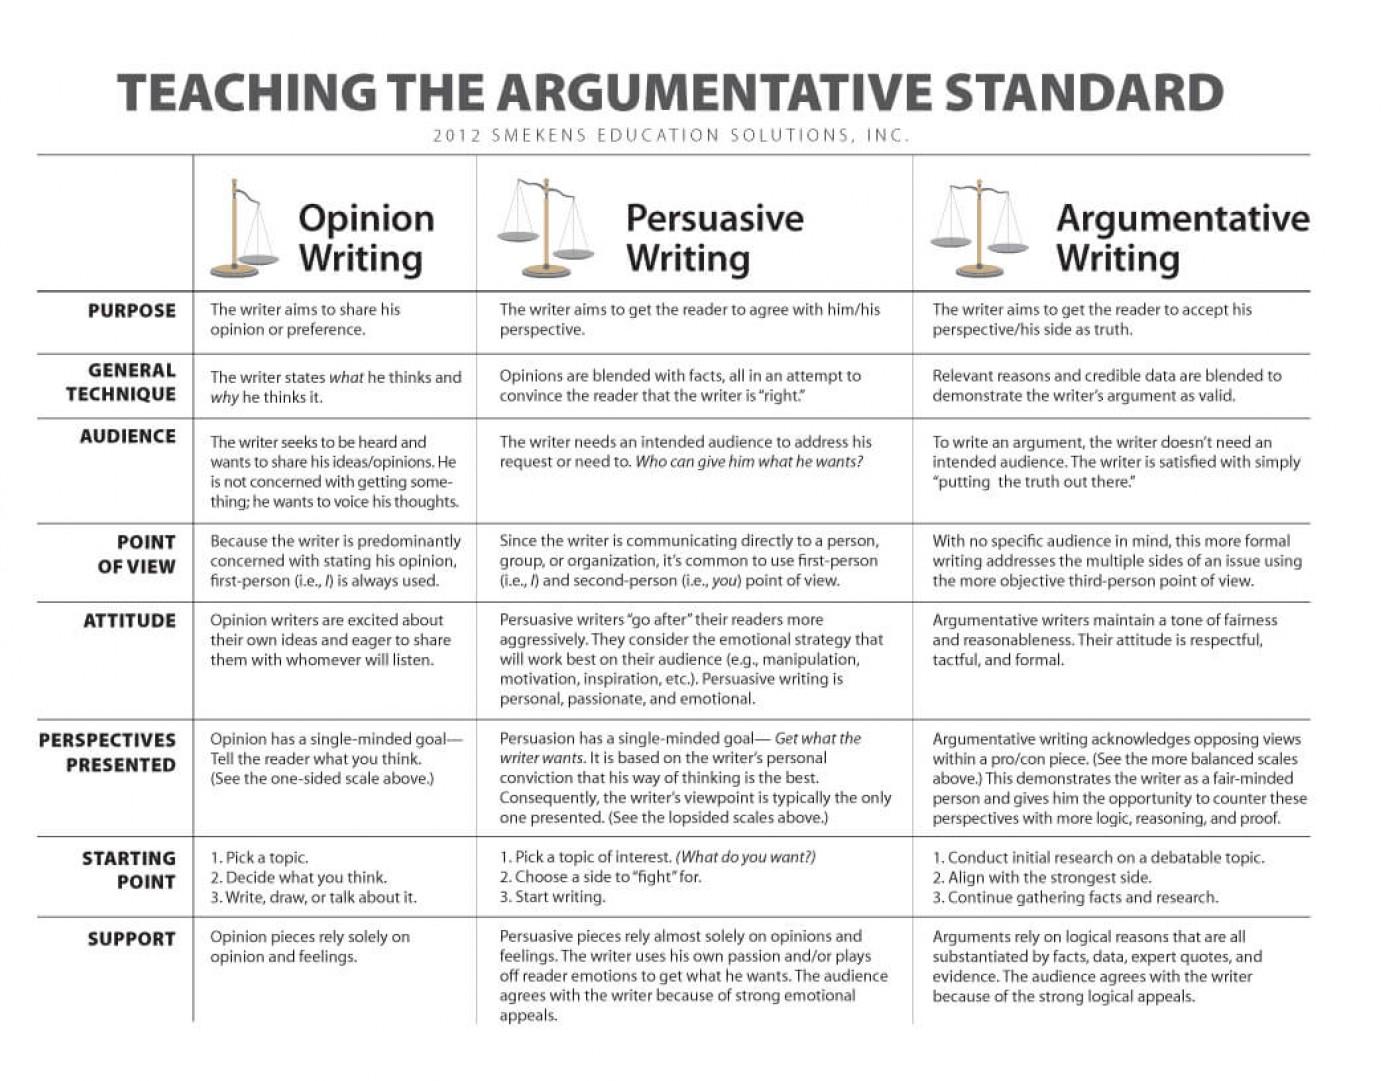 010 Teaching The Argumetative Standardo Essay Example Parts Of Imposing 6 A Persuasive 1400